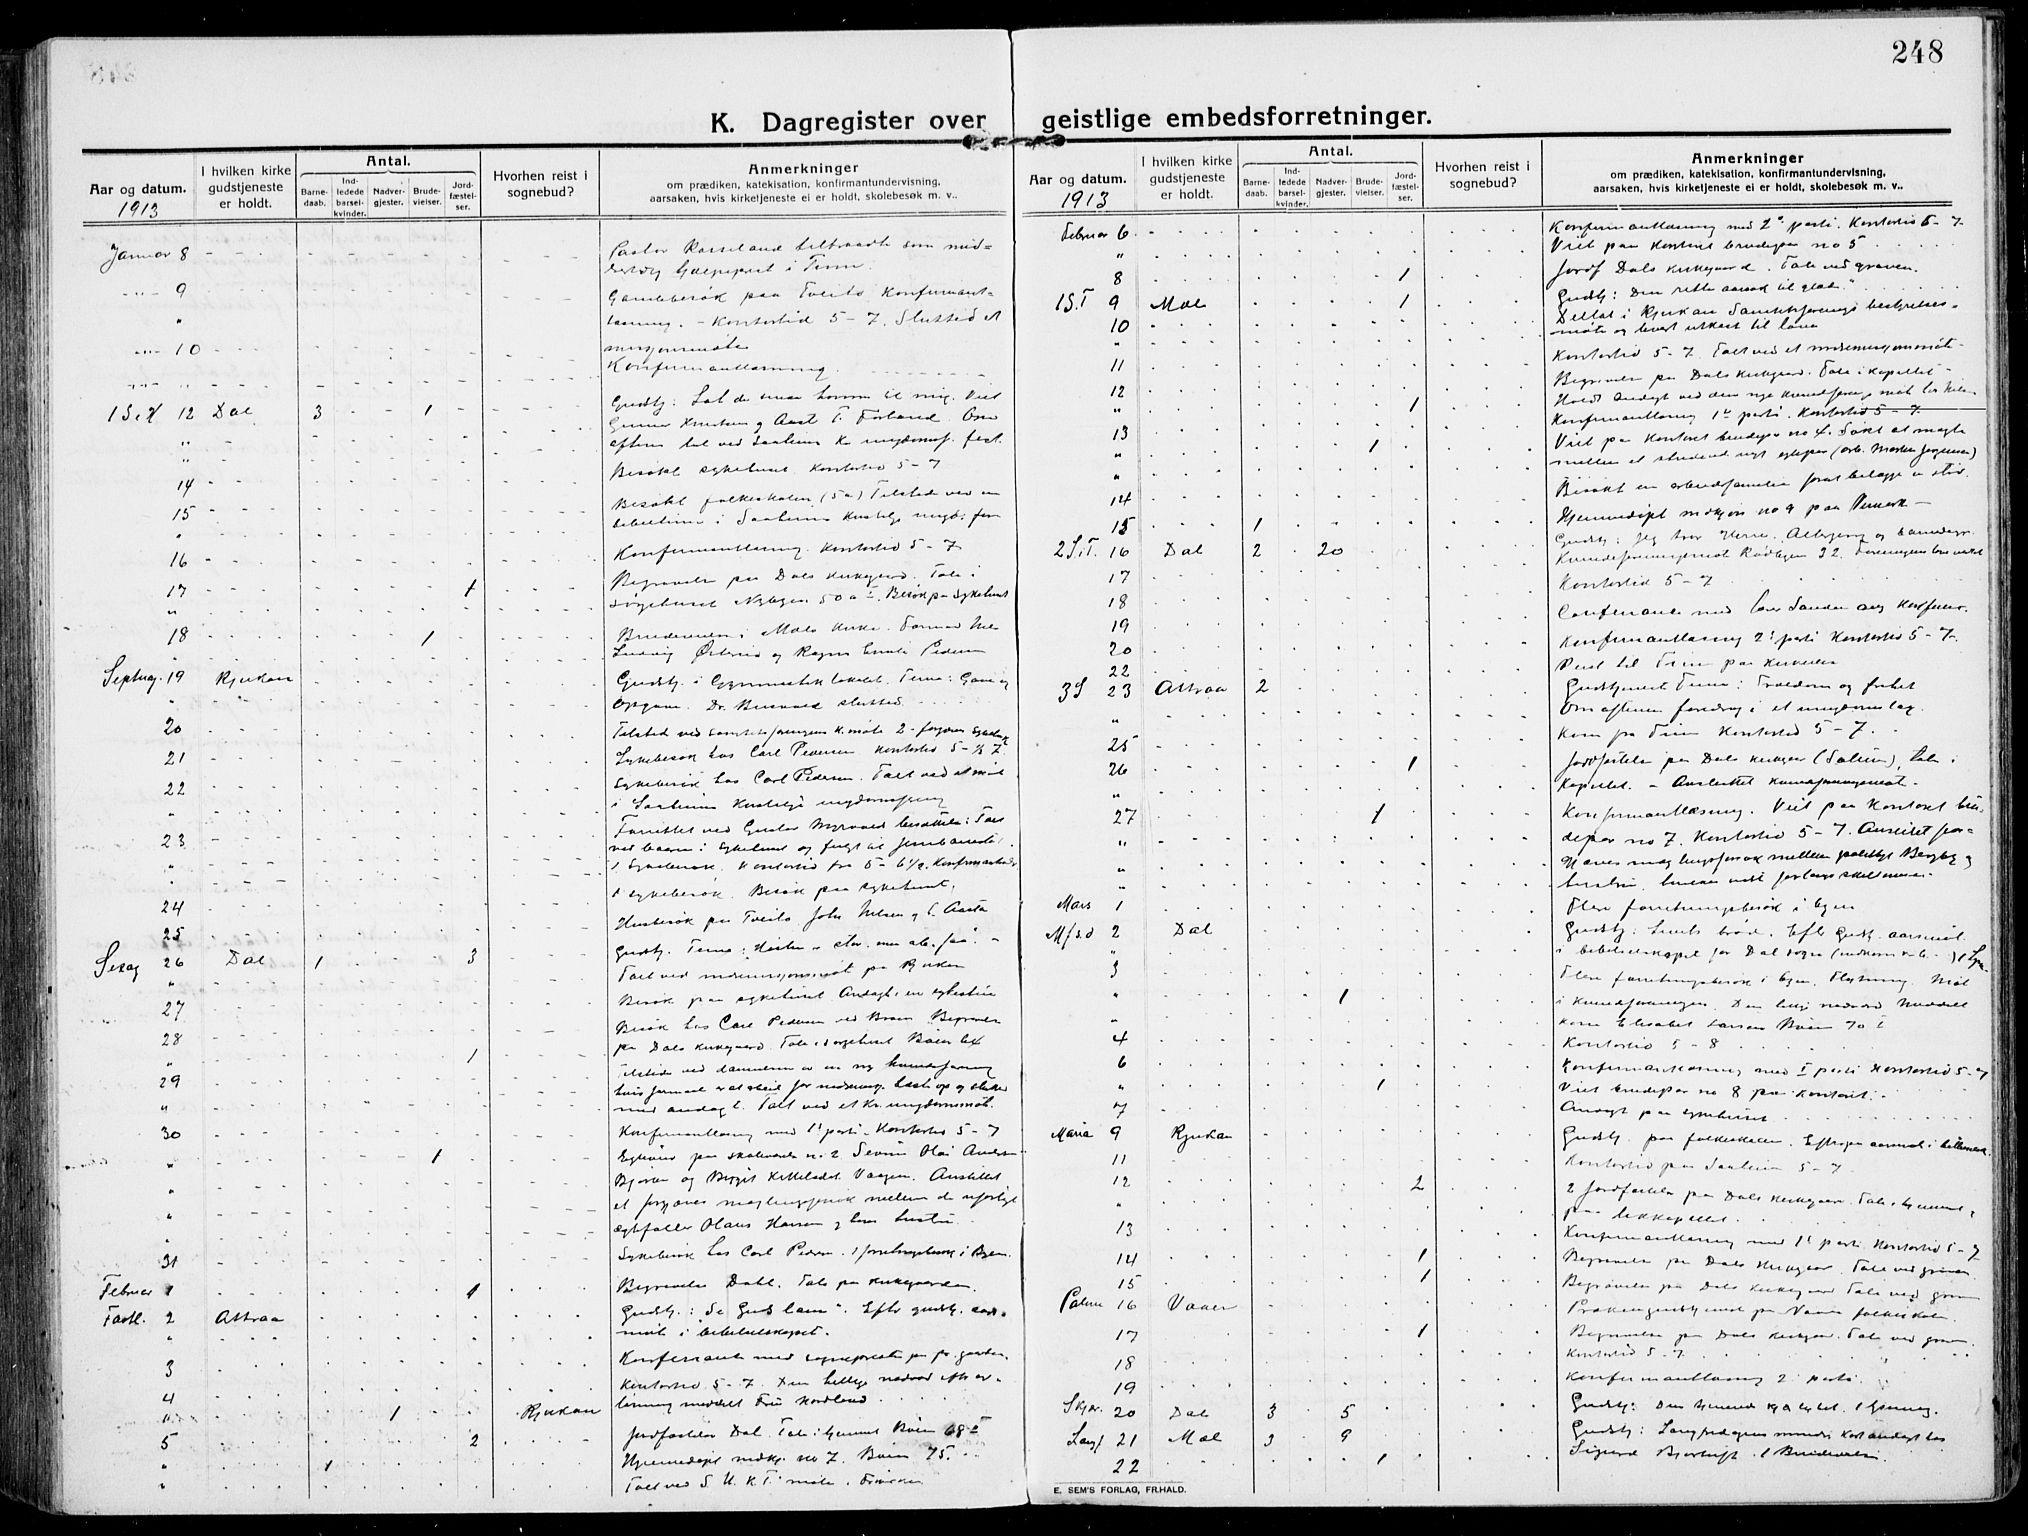 SAKO, Rjukan kirkebøker, F/Fa/L0002: Ministerialbok nr. 2, 1912-1917, s. 248